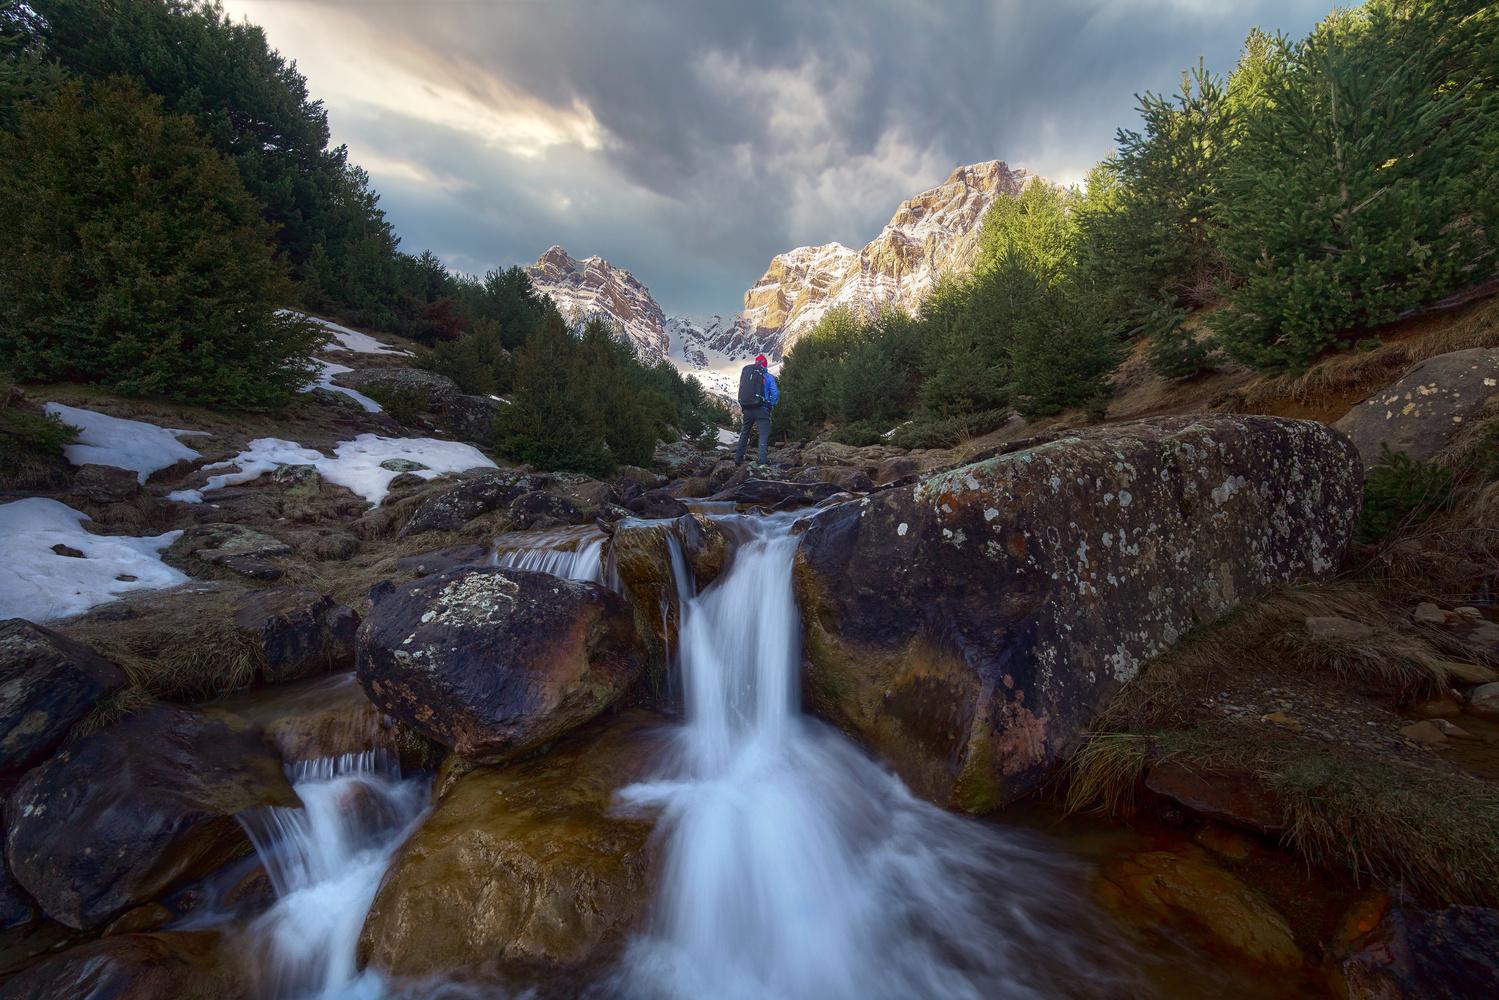 Sunrise in the creek by Ricardo Gayan